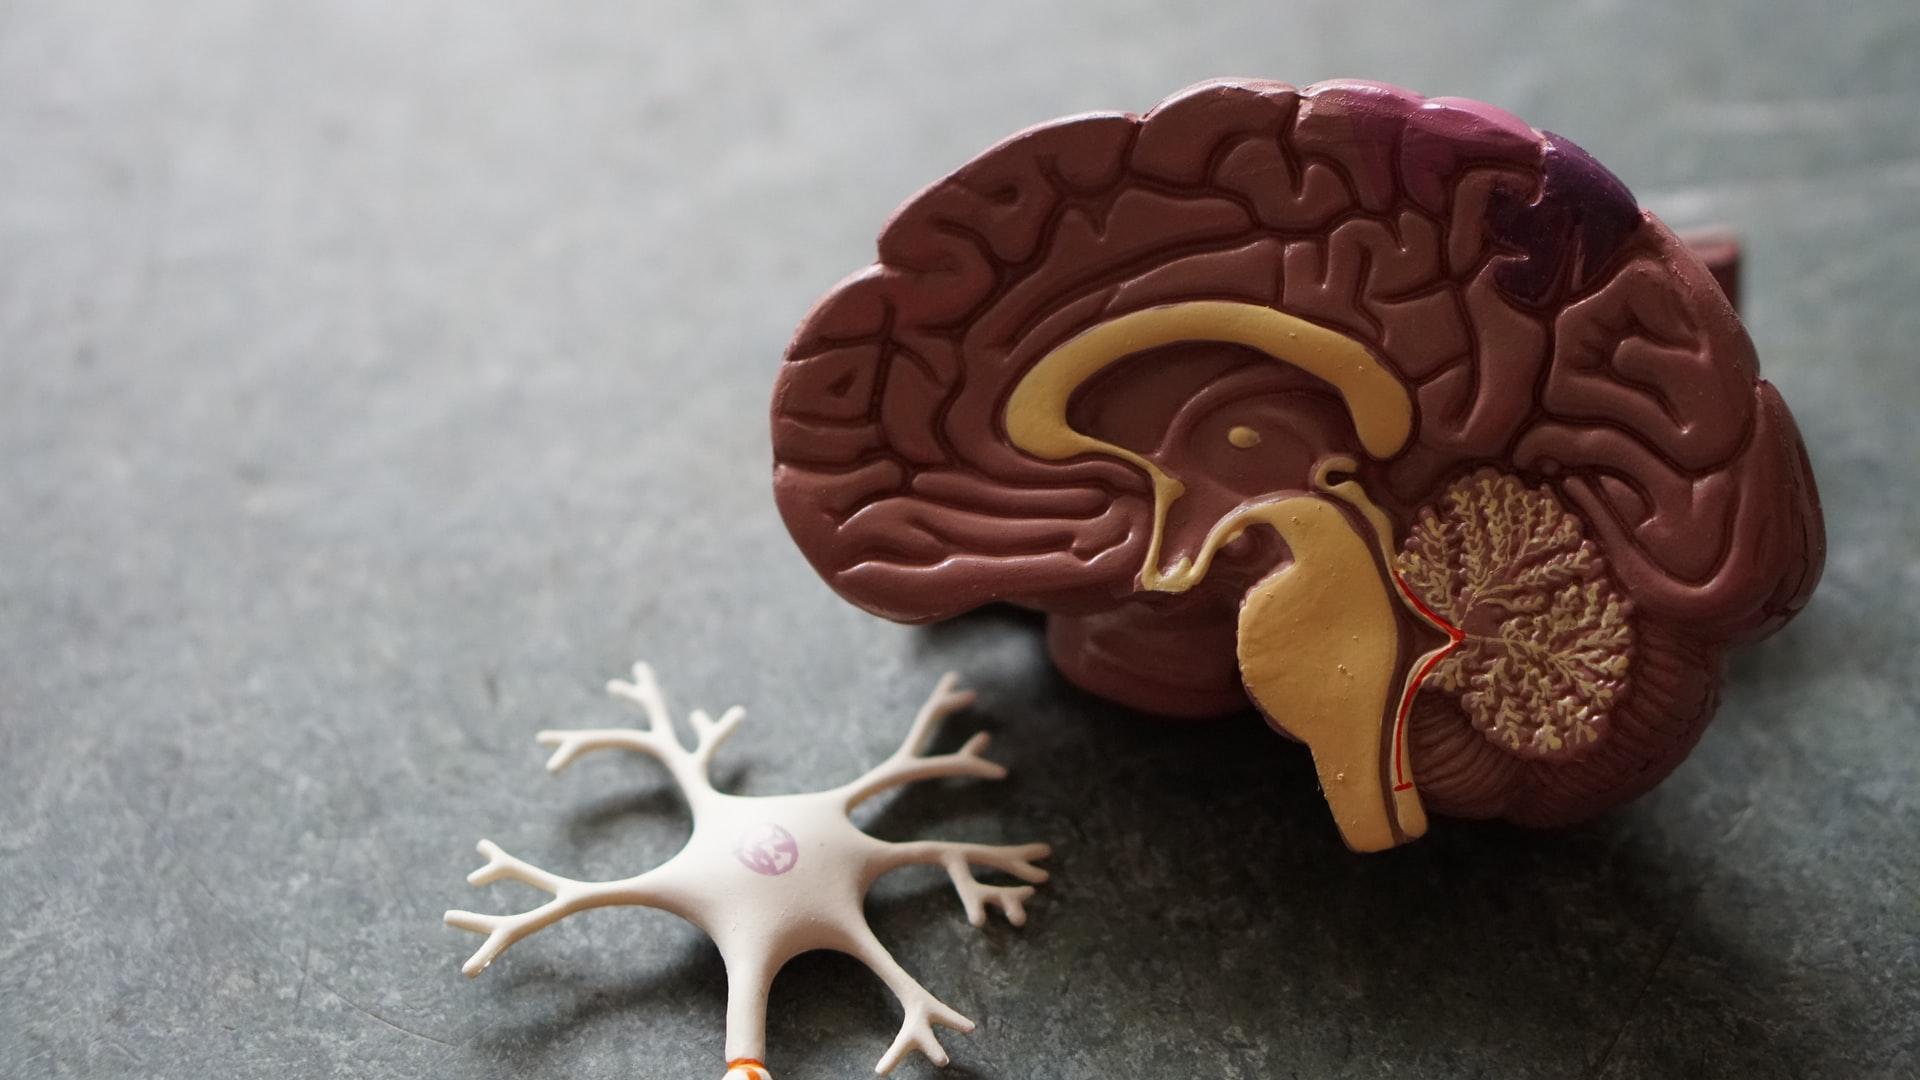 figure-of-a-brain